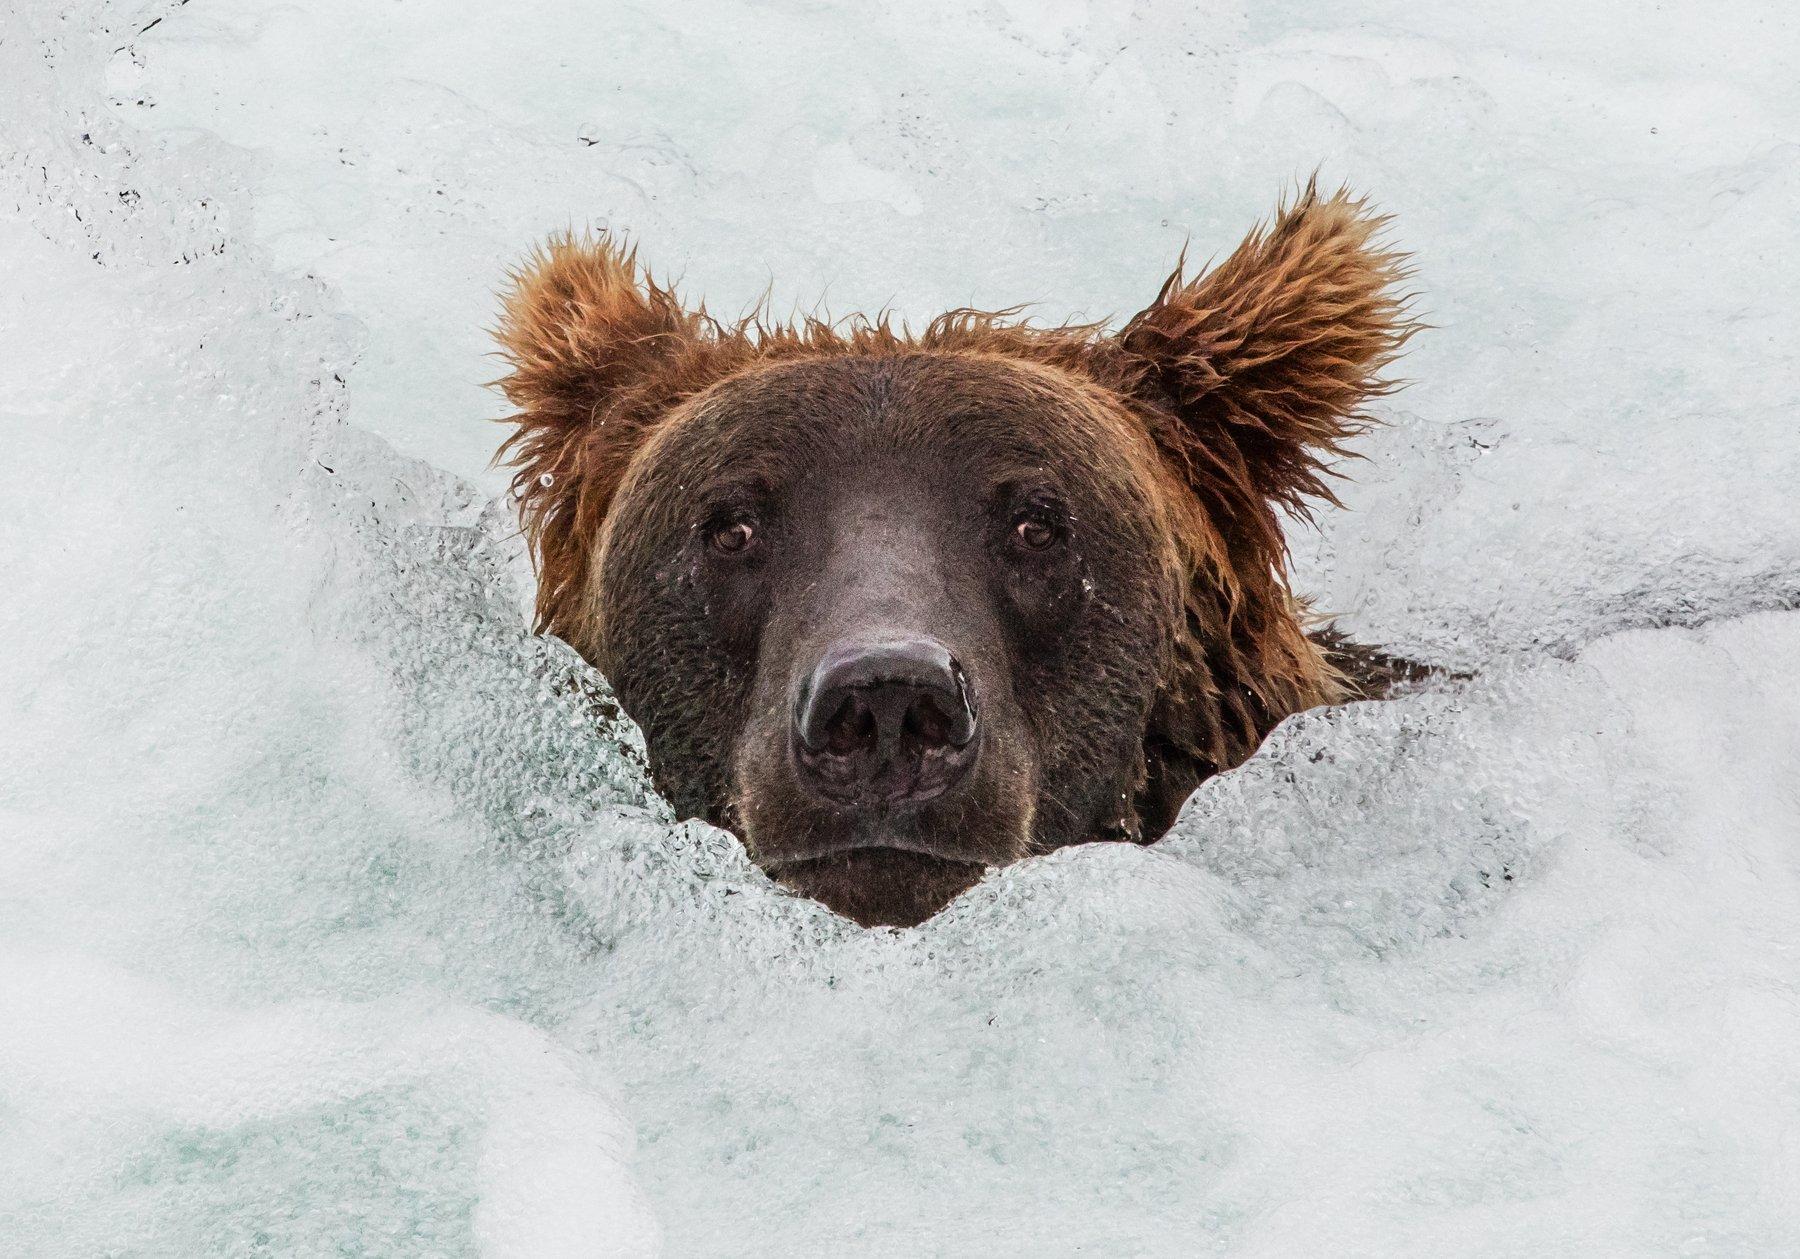 Аляска, США, Алексей Сулоев